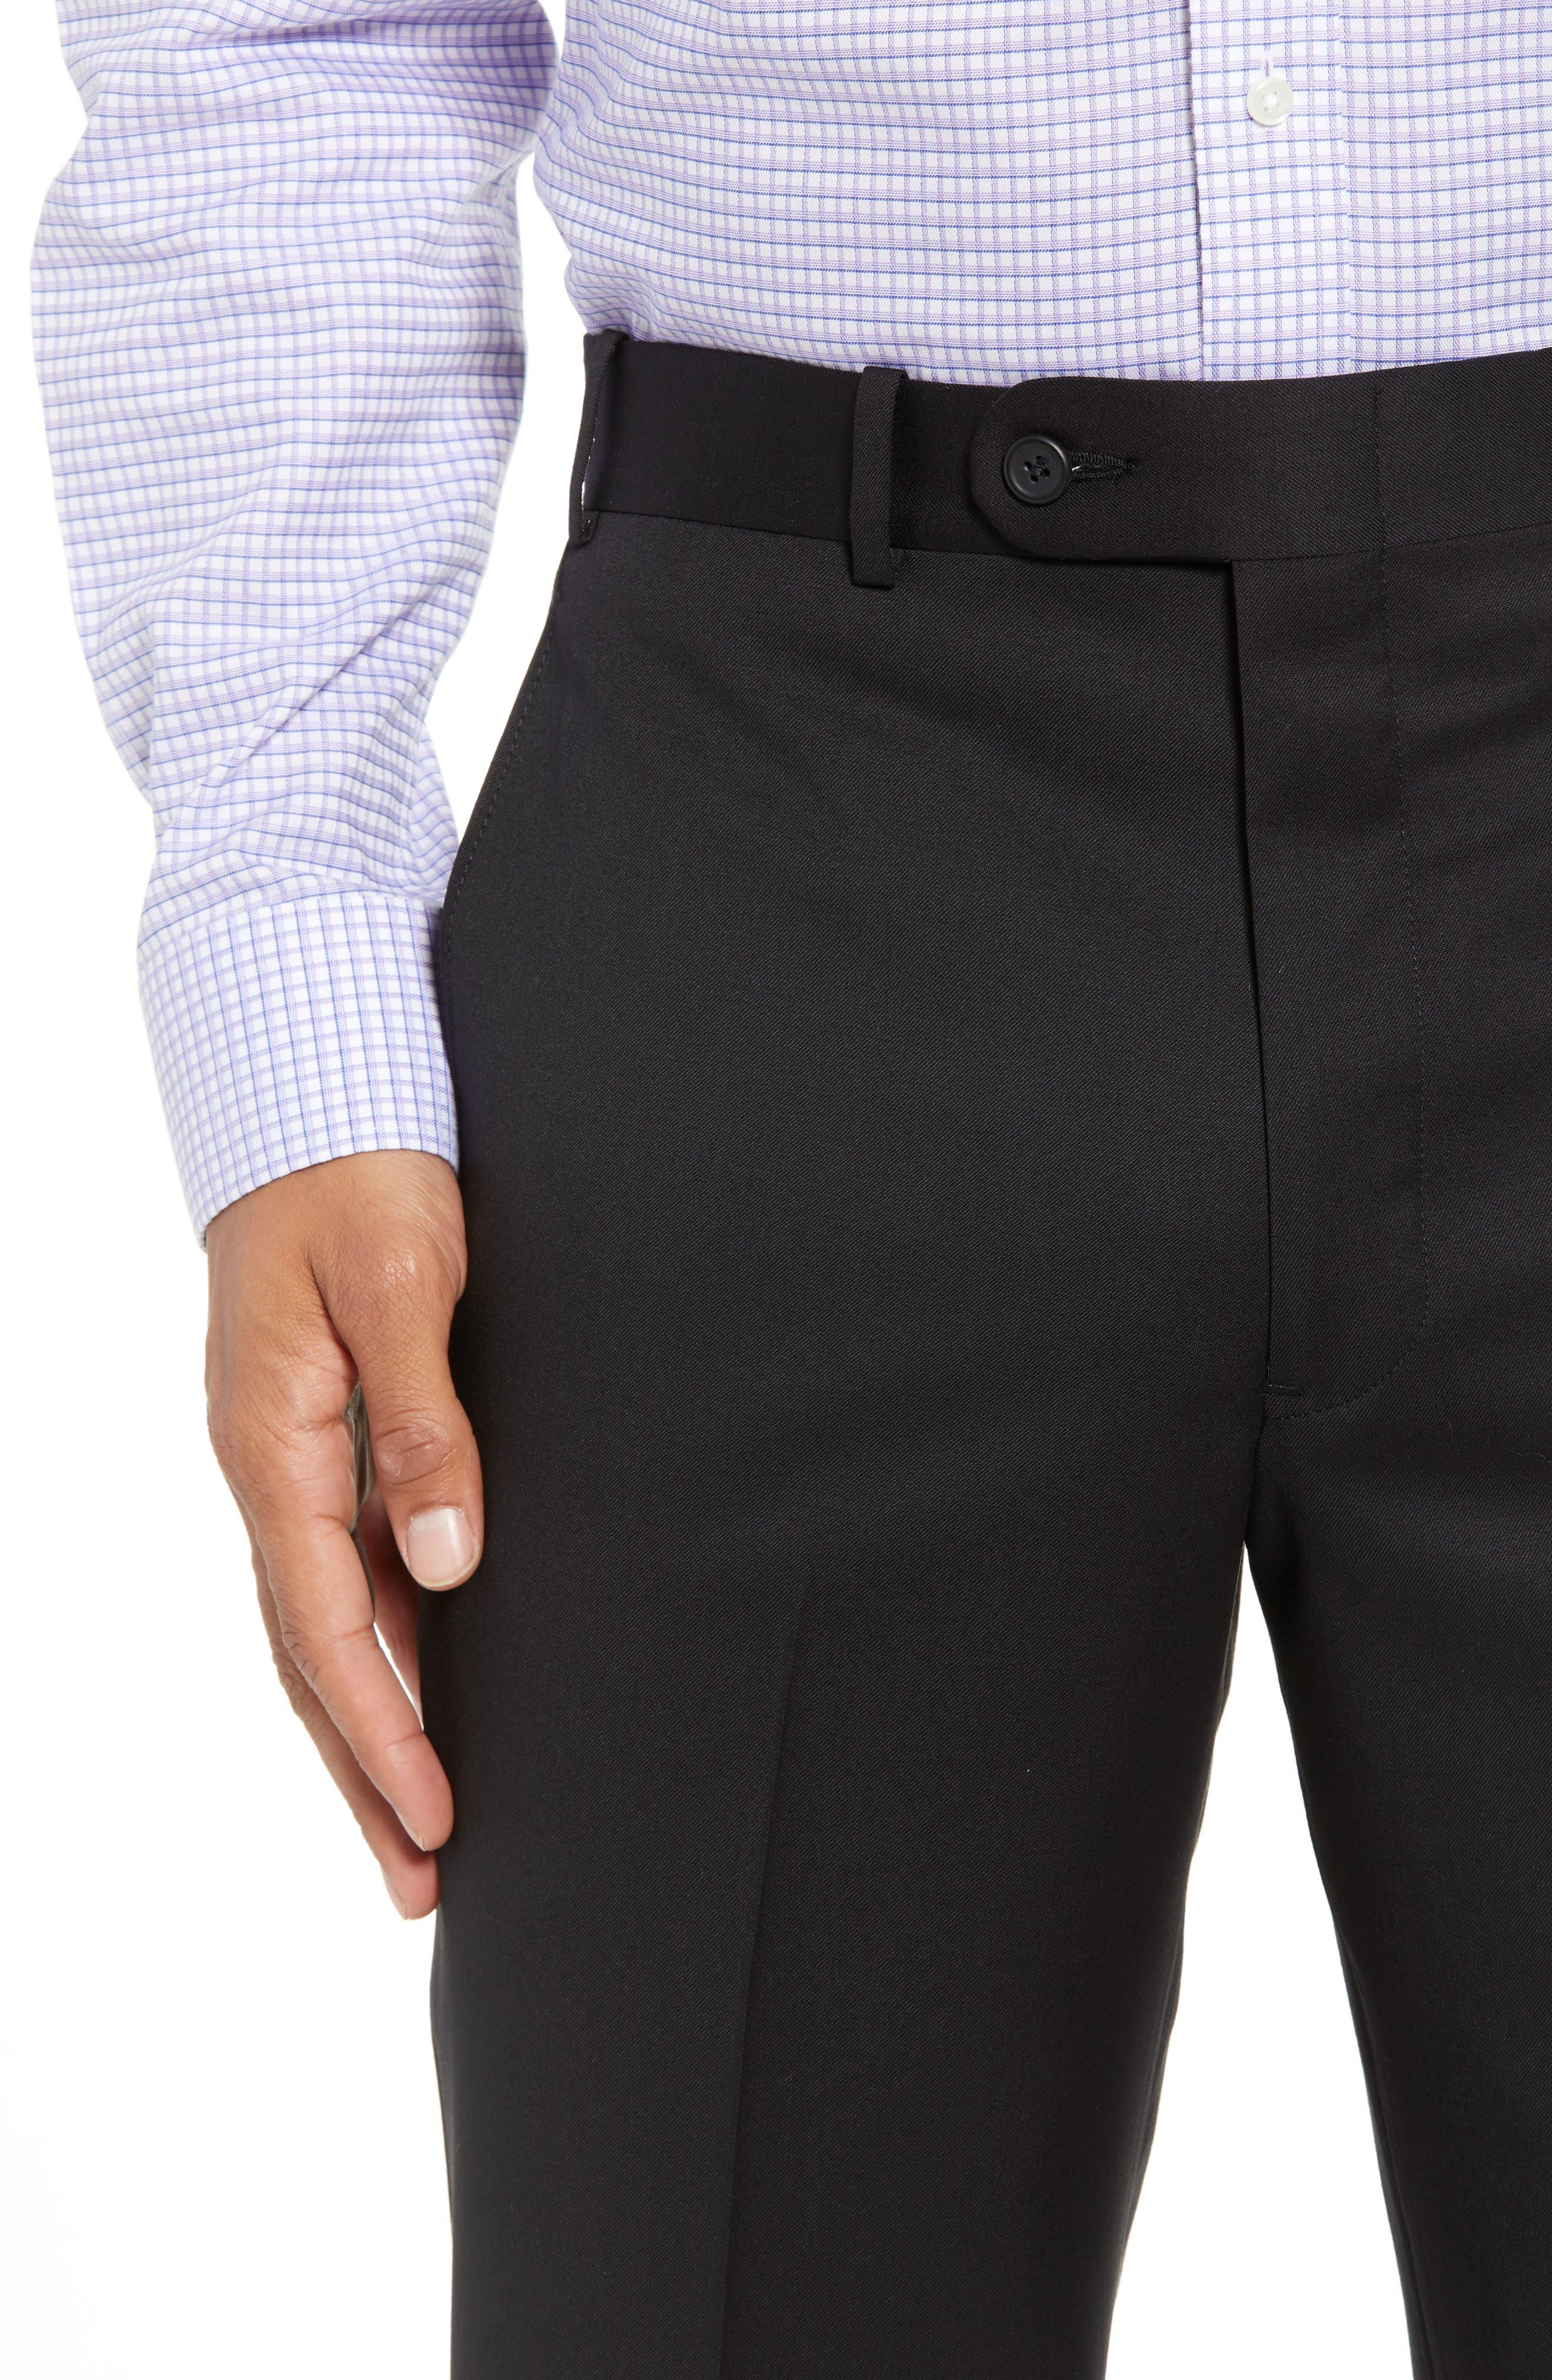 Torino Flat Front Wool Gabardine Trousers,                             Alternate thumbnail 4, color,                             001